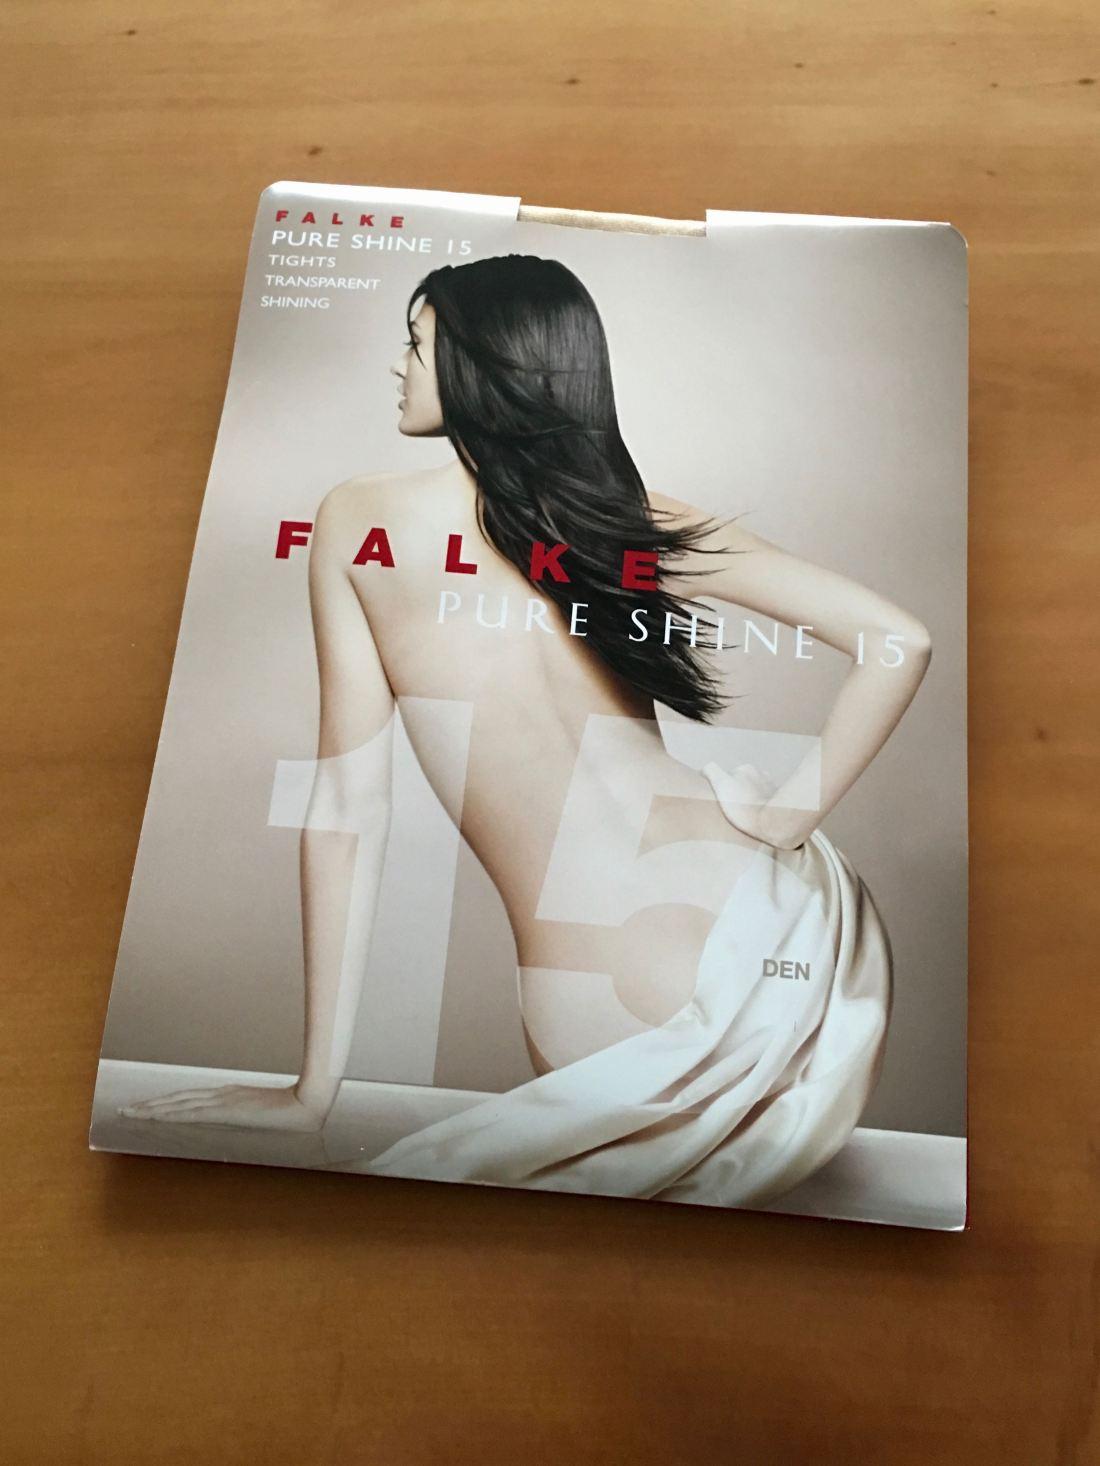 9a9f0306b Review  Falke Pure Shine 15 Tights (Updated  25 Apr 19) – i love hosiery